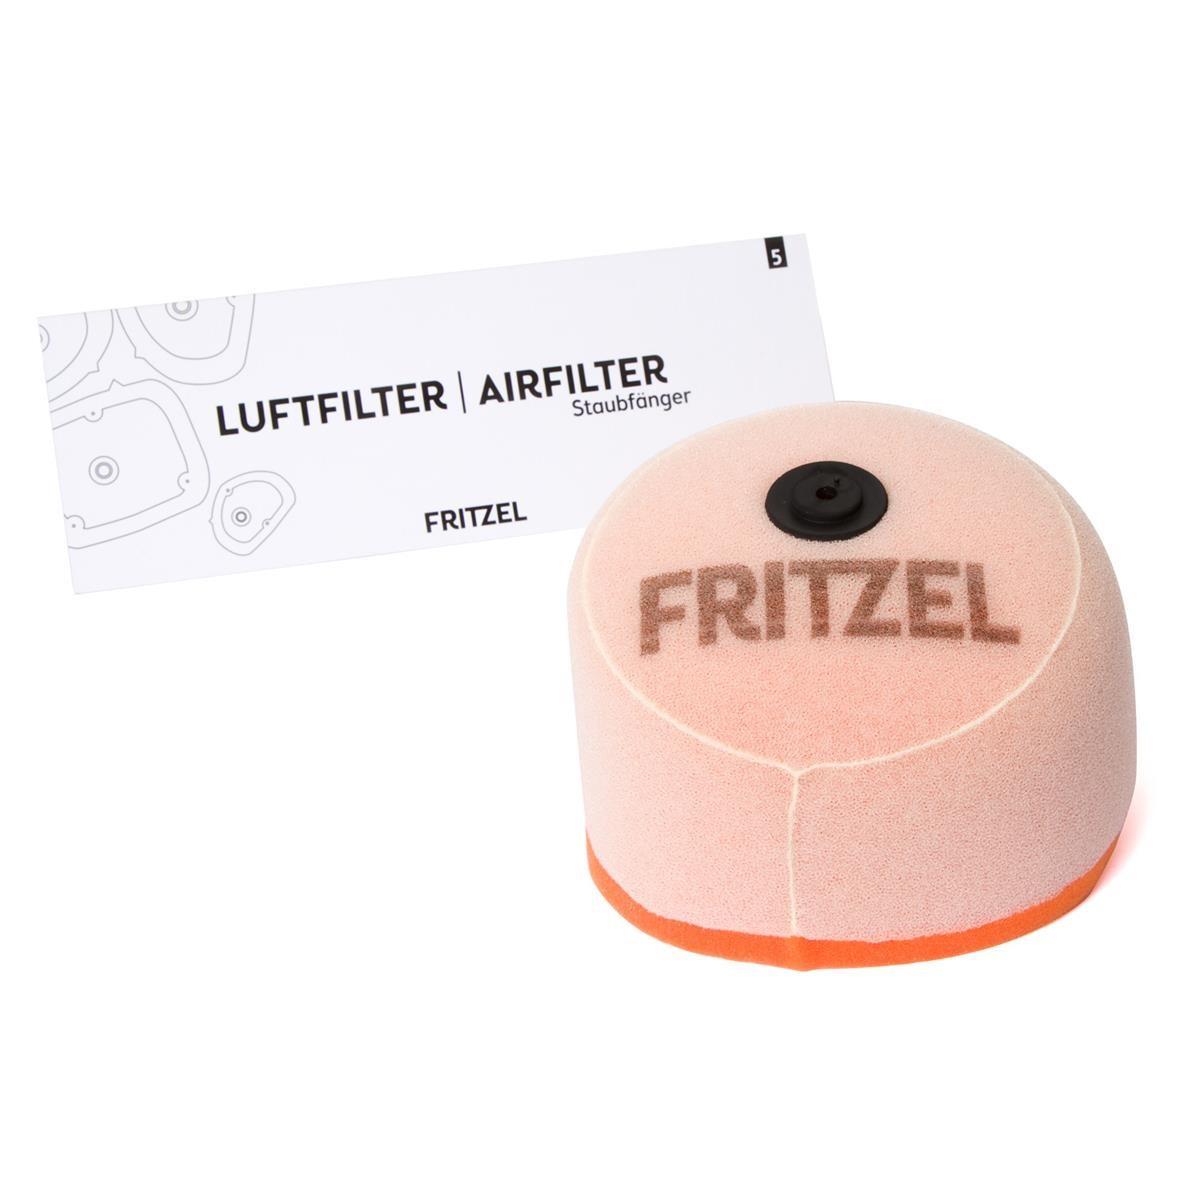 FRITZEL Luftfilter Staubfänger Suzuki RM 125/250, RMZ 250/450